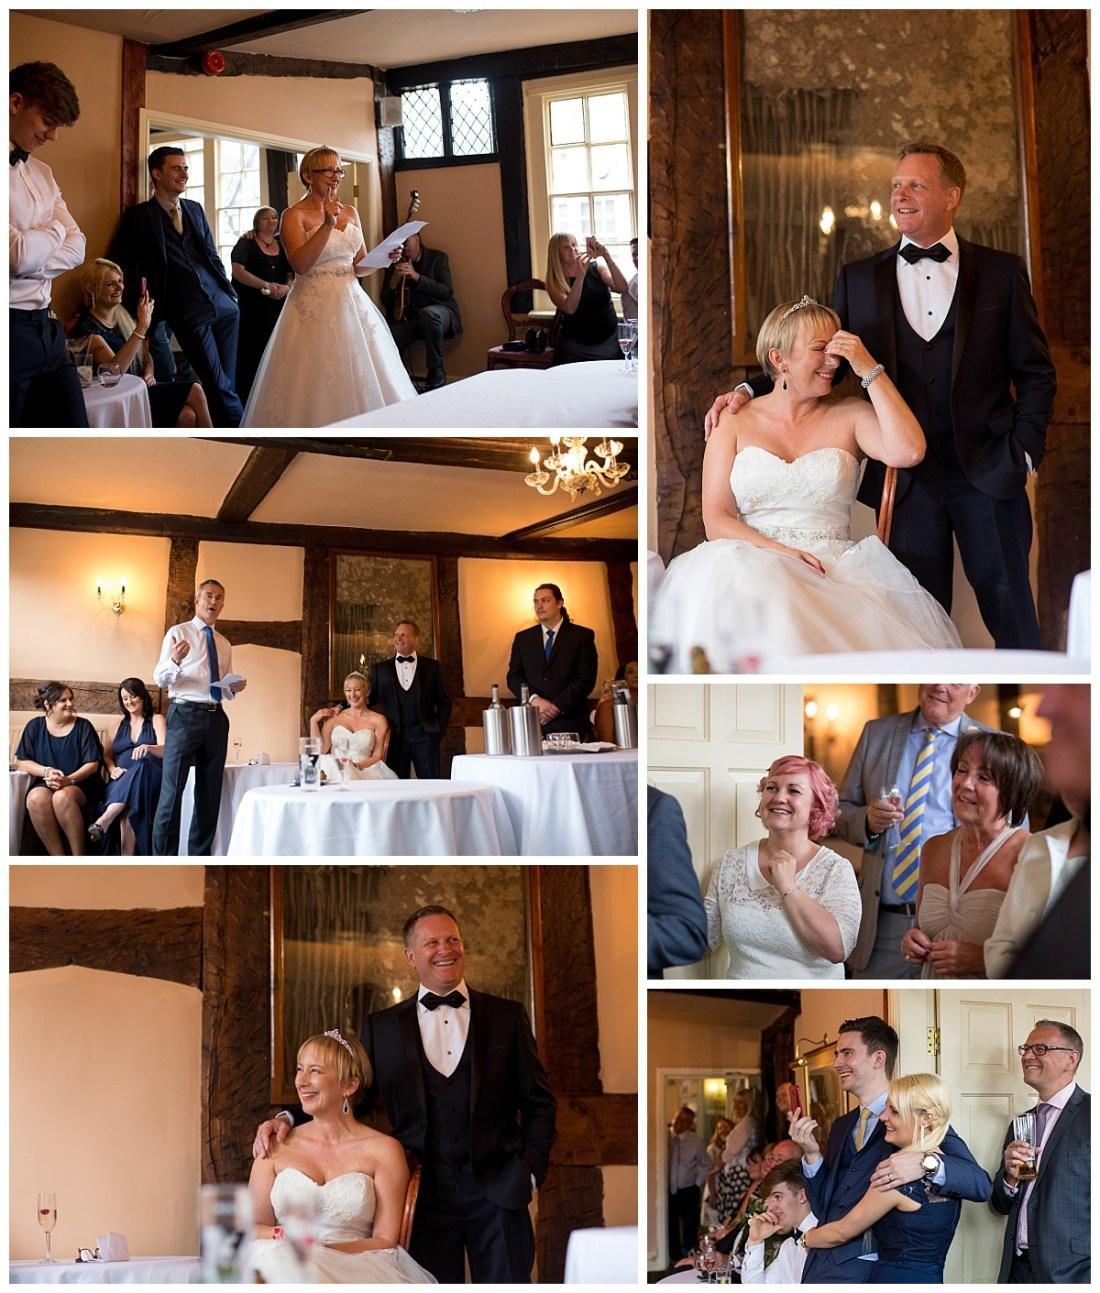 Wedding Photographer Crewe and Nantwich